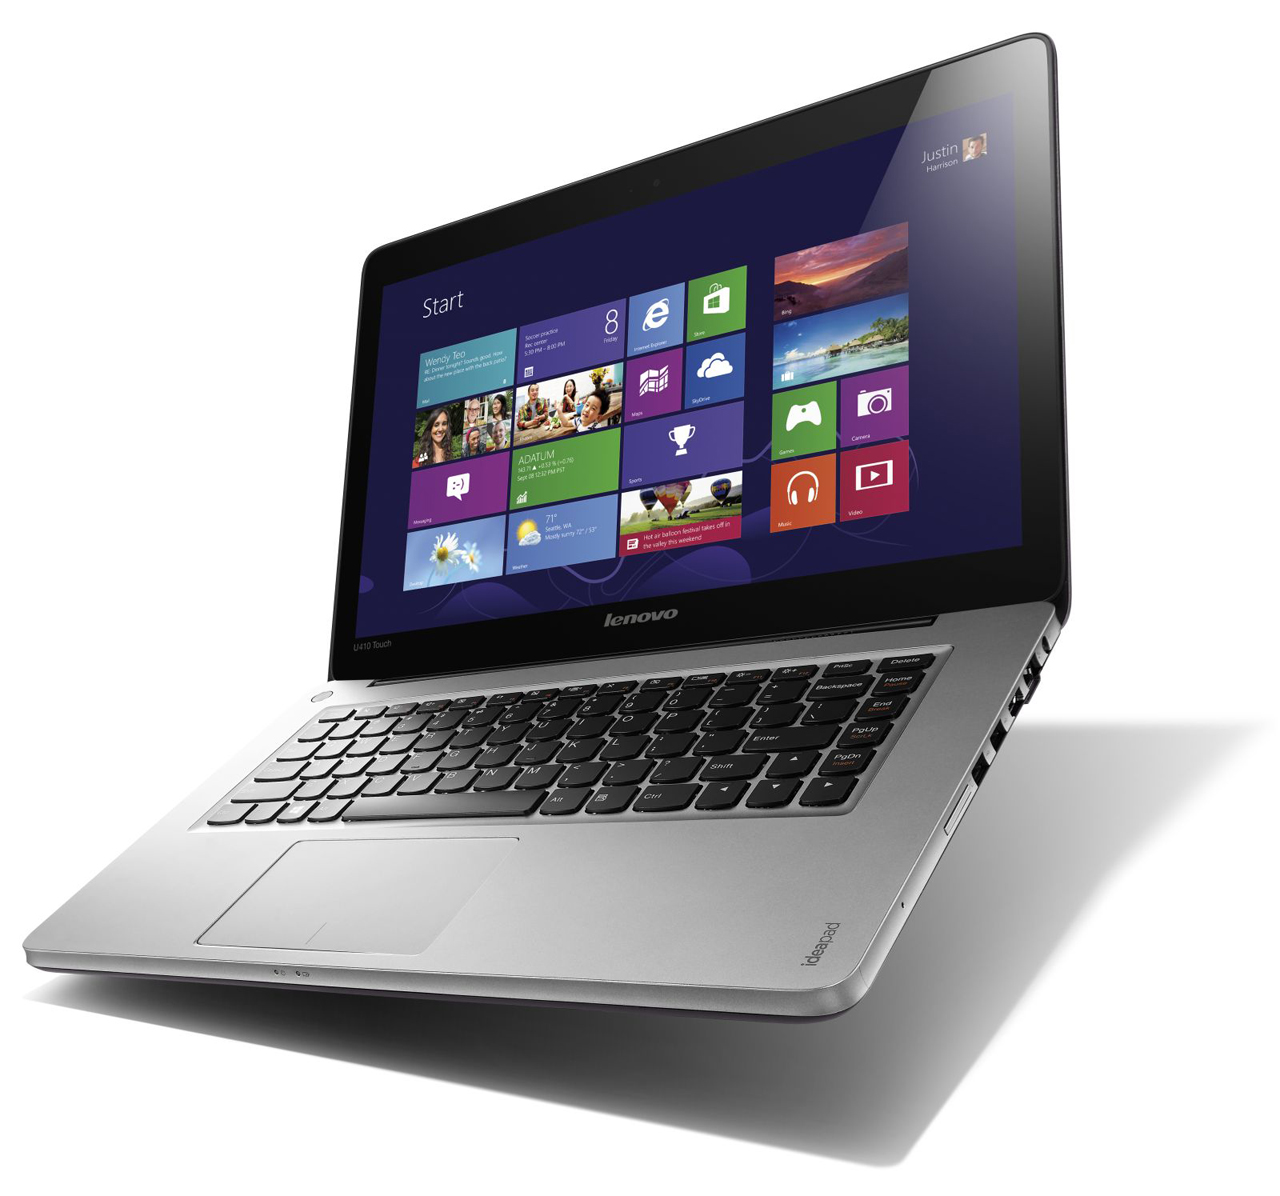 Laptop Terbaik 2014